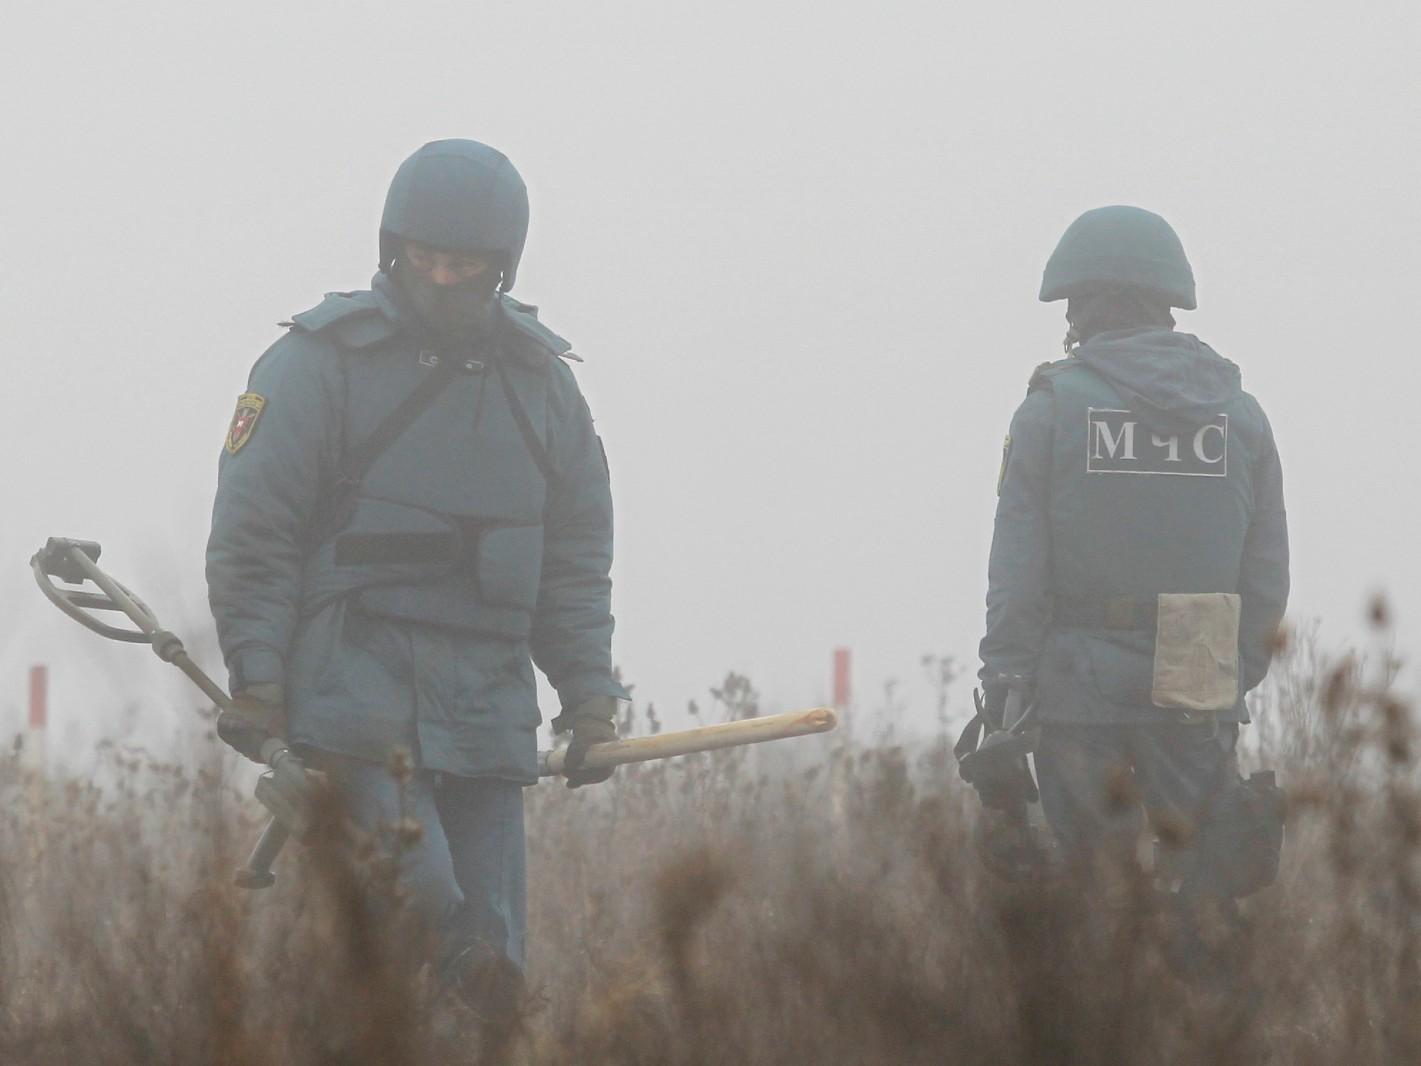 2019-11-19T134913Z_1125823718_RC2DED9UMDV8_RTRMADP_3_UKRAINE-CRISIS-DEMINING (3) (2)